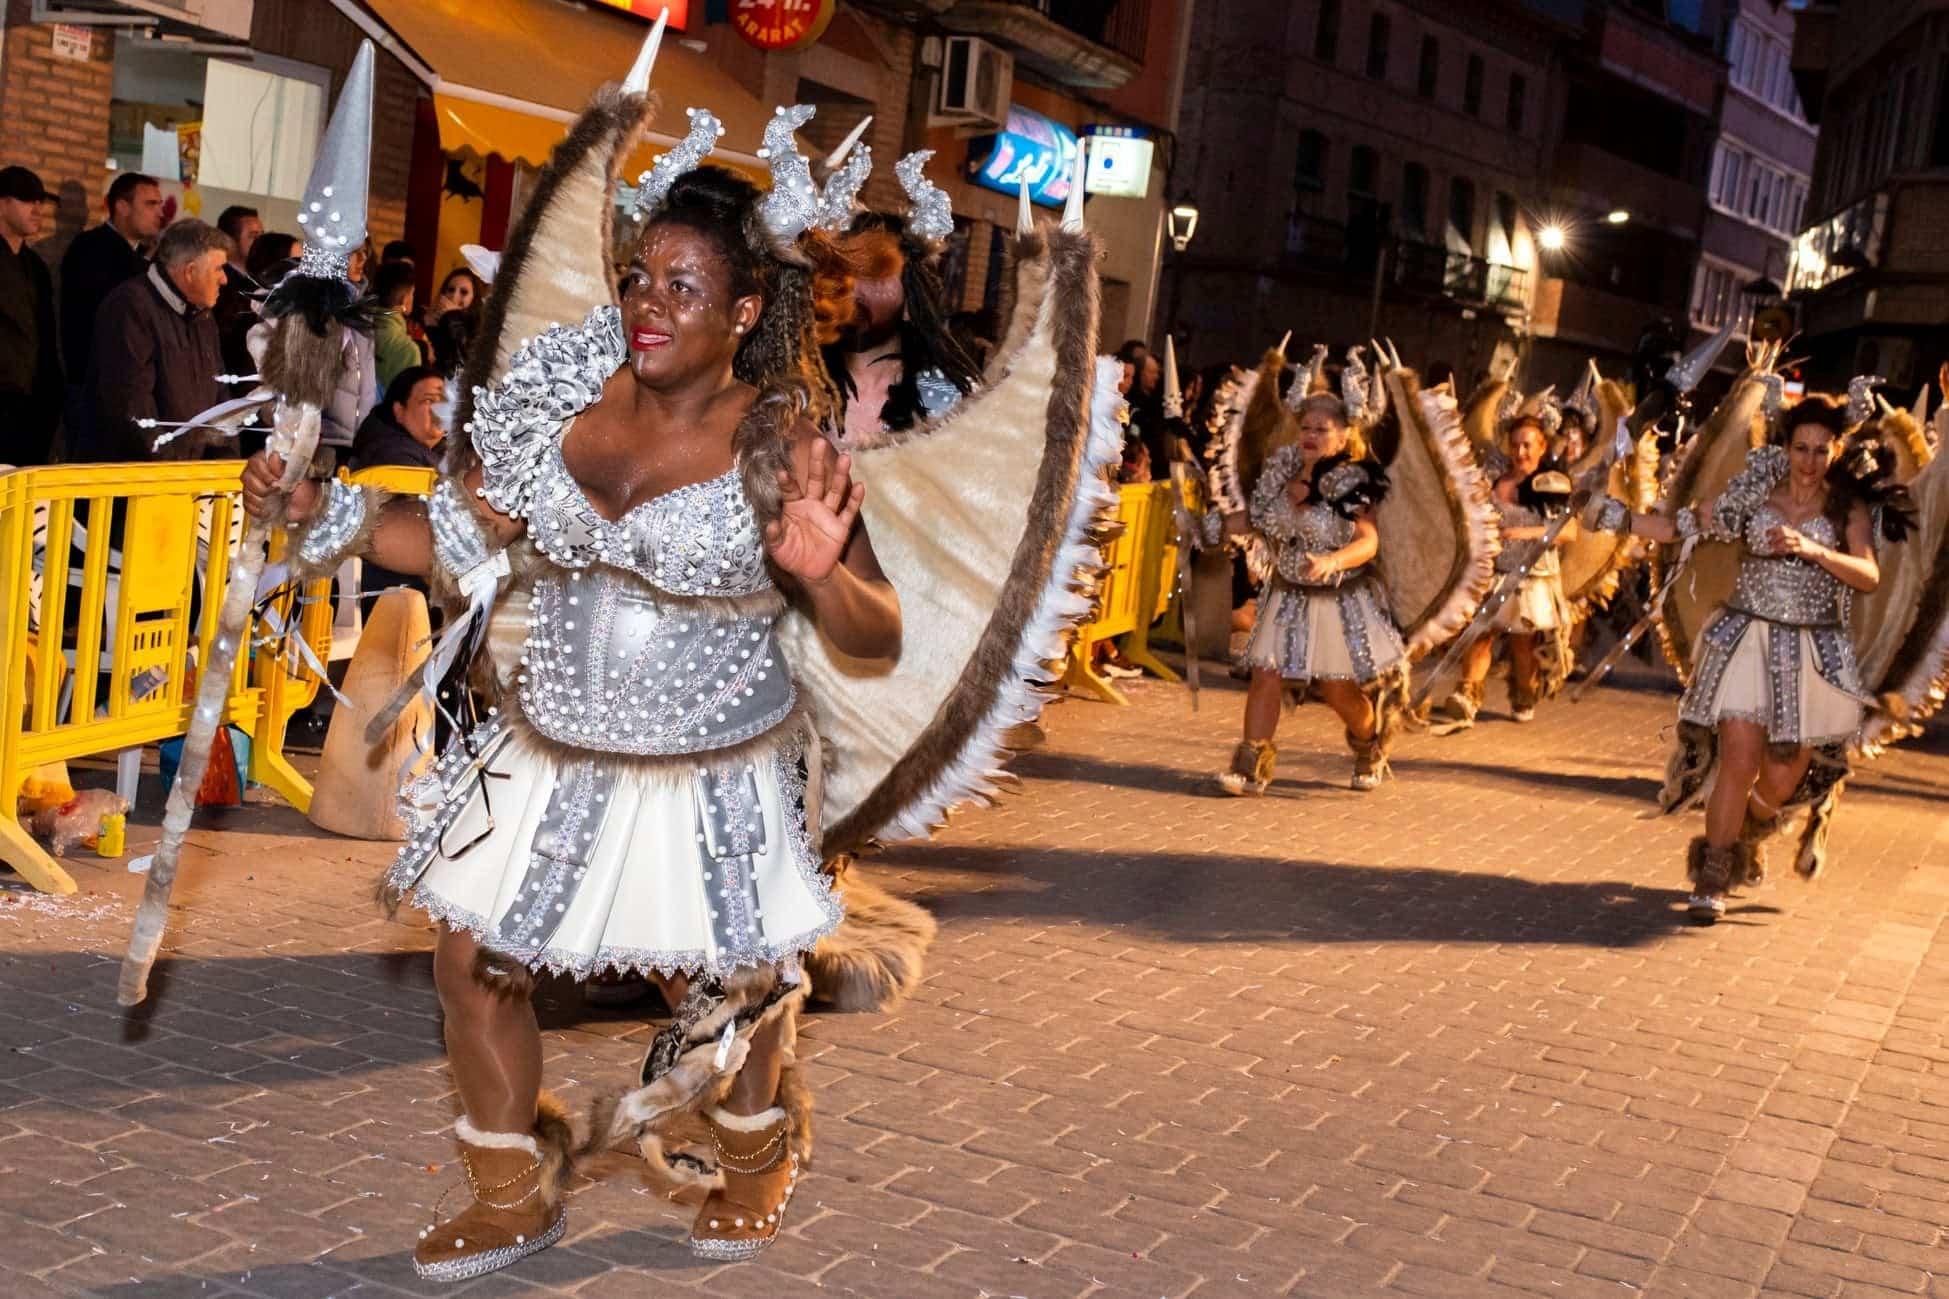 Carnaval de herencia 2020 ofertorio 58 - Selección de fotografías del Ofertorio del Carnaval de Herencia